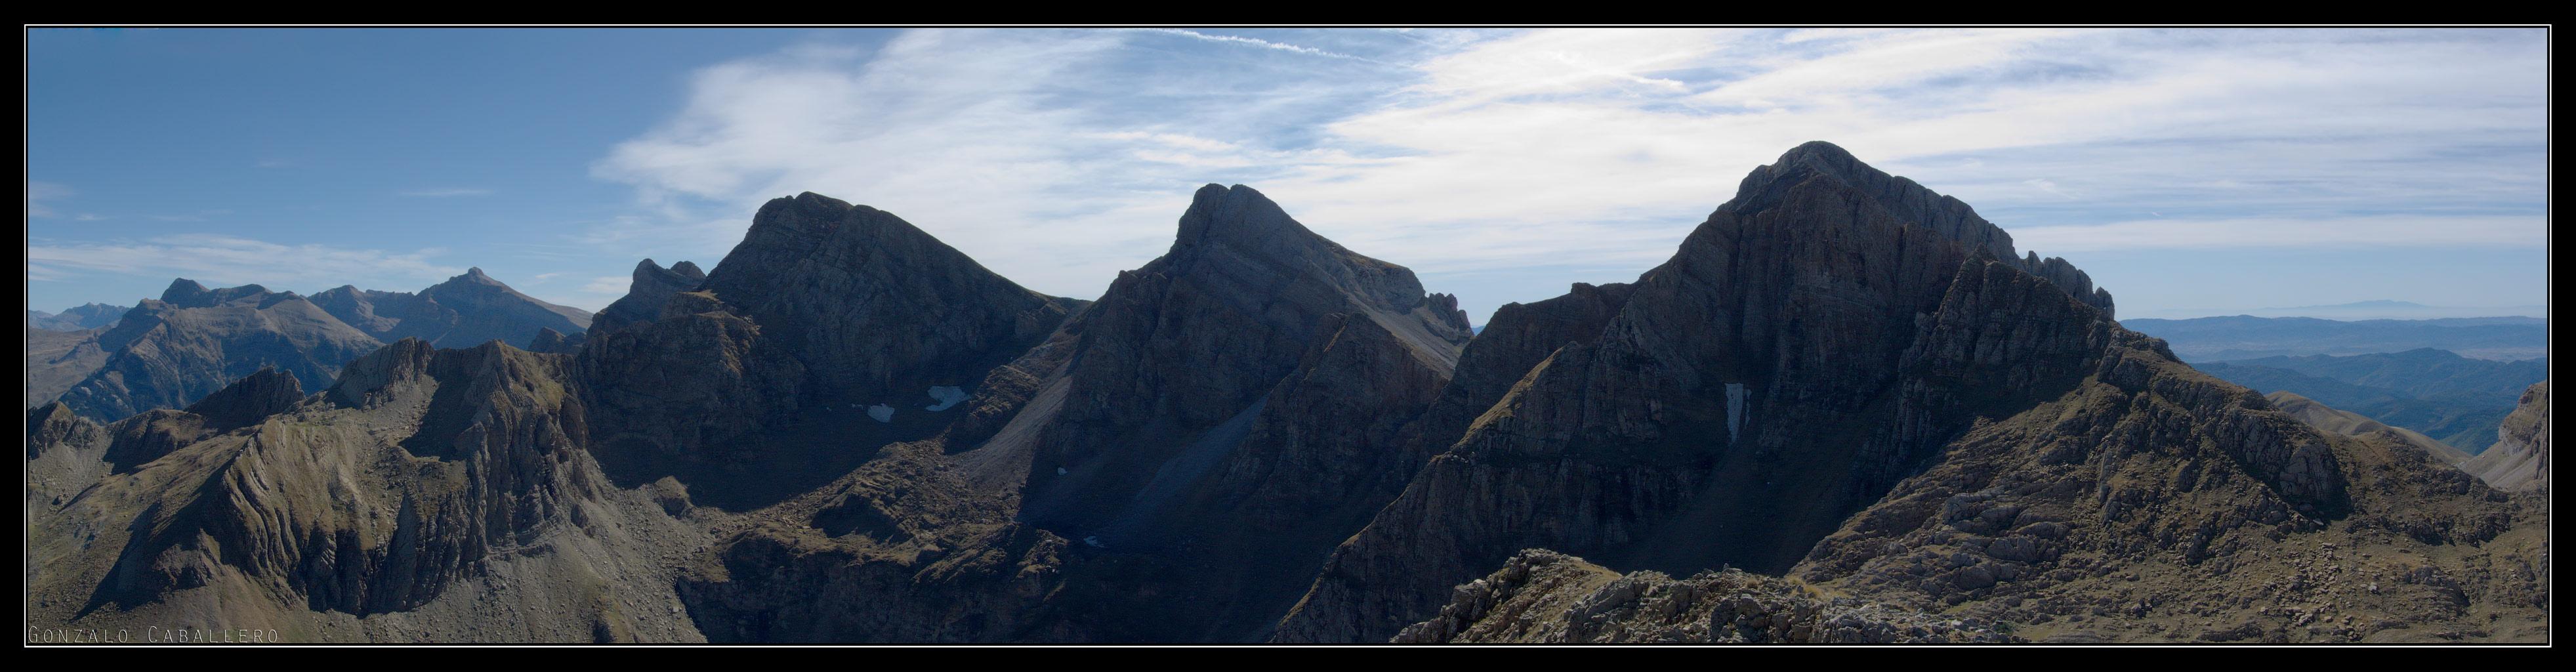 Cara norte de la Sierra de Aísa